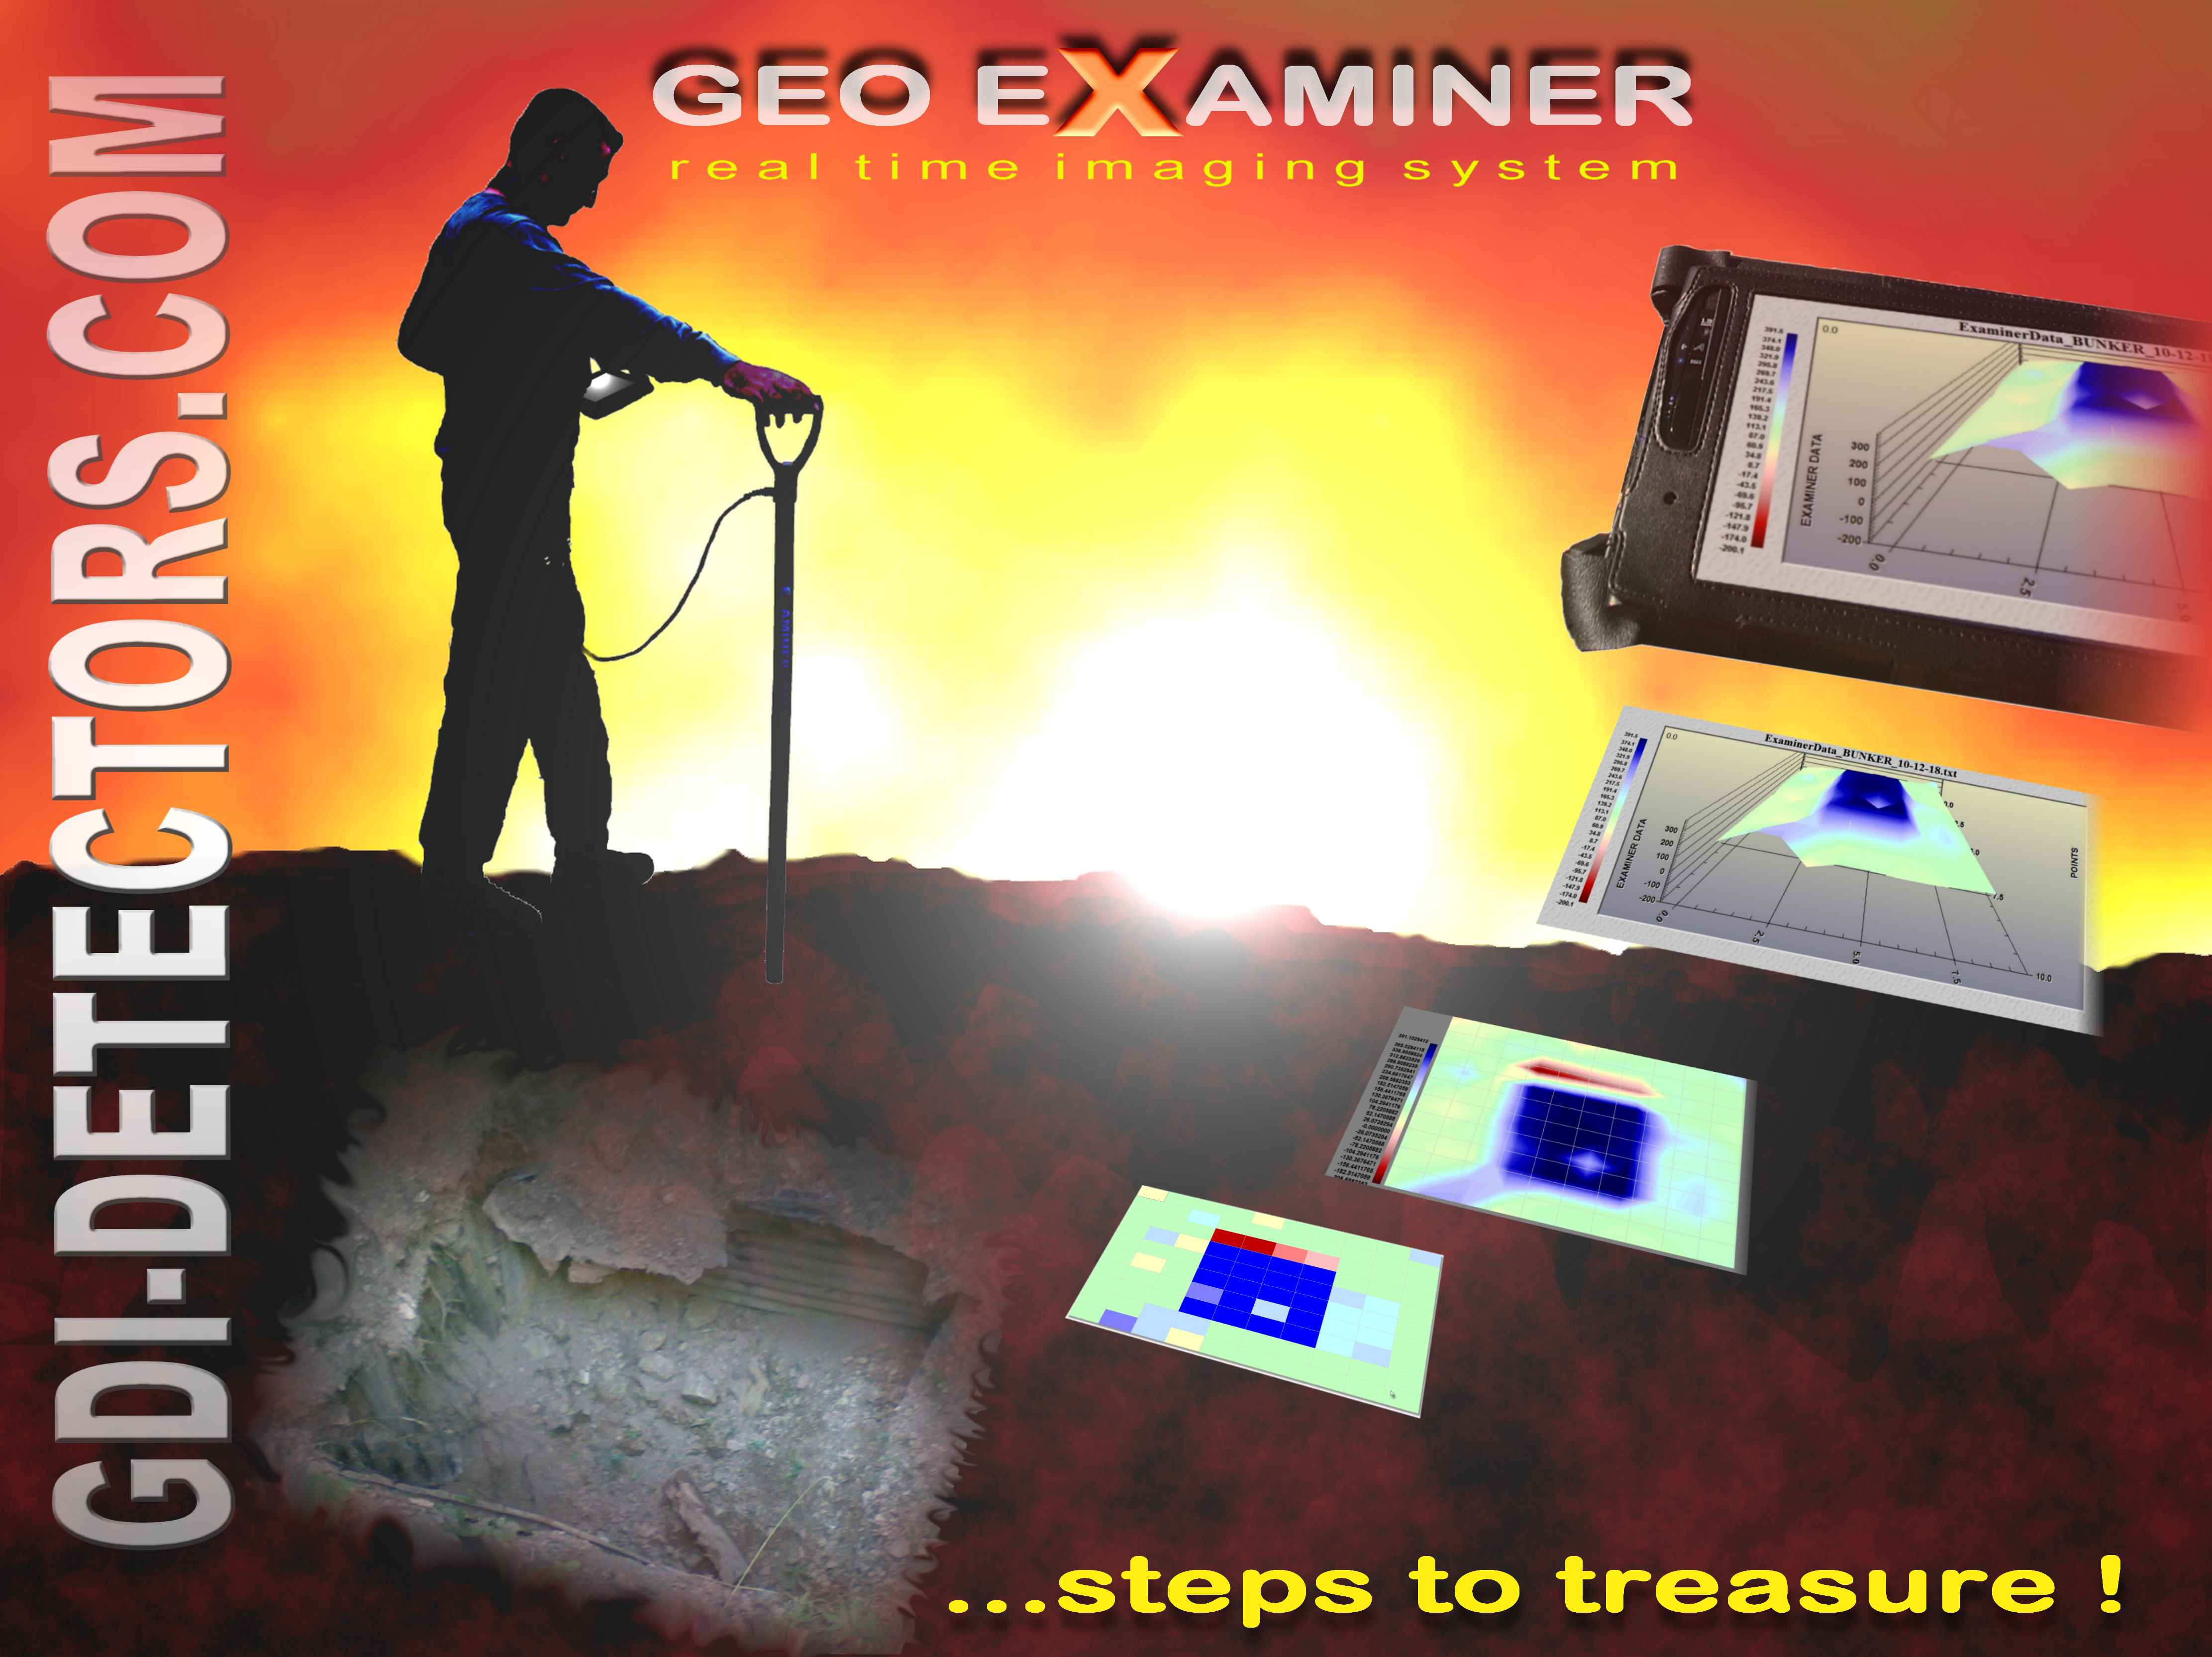 Gdi Detectors Geophysical Instruments Metal Gold Image Locators Detector Professional Detecting Long Range Geo Examiner